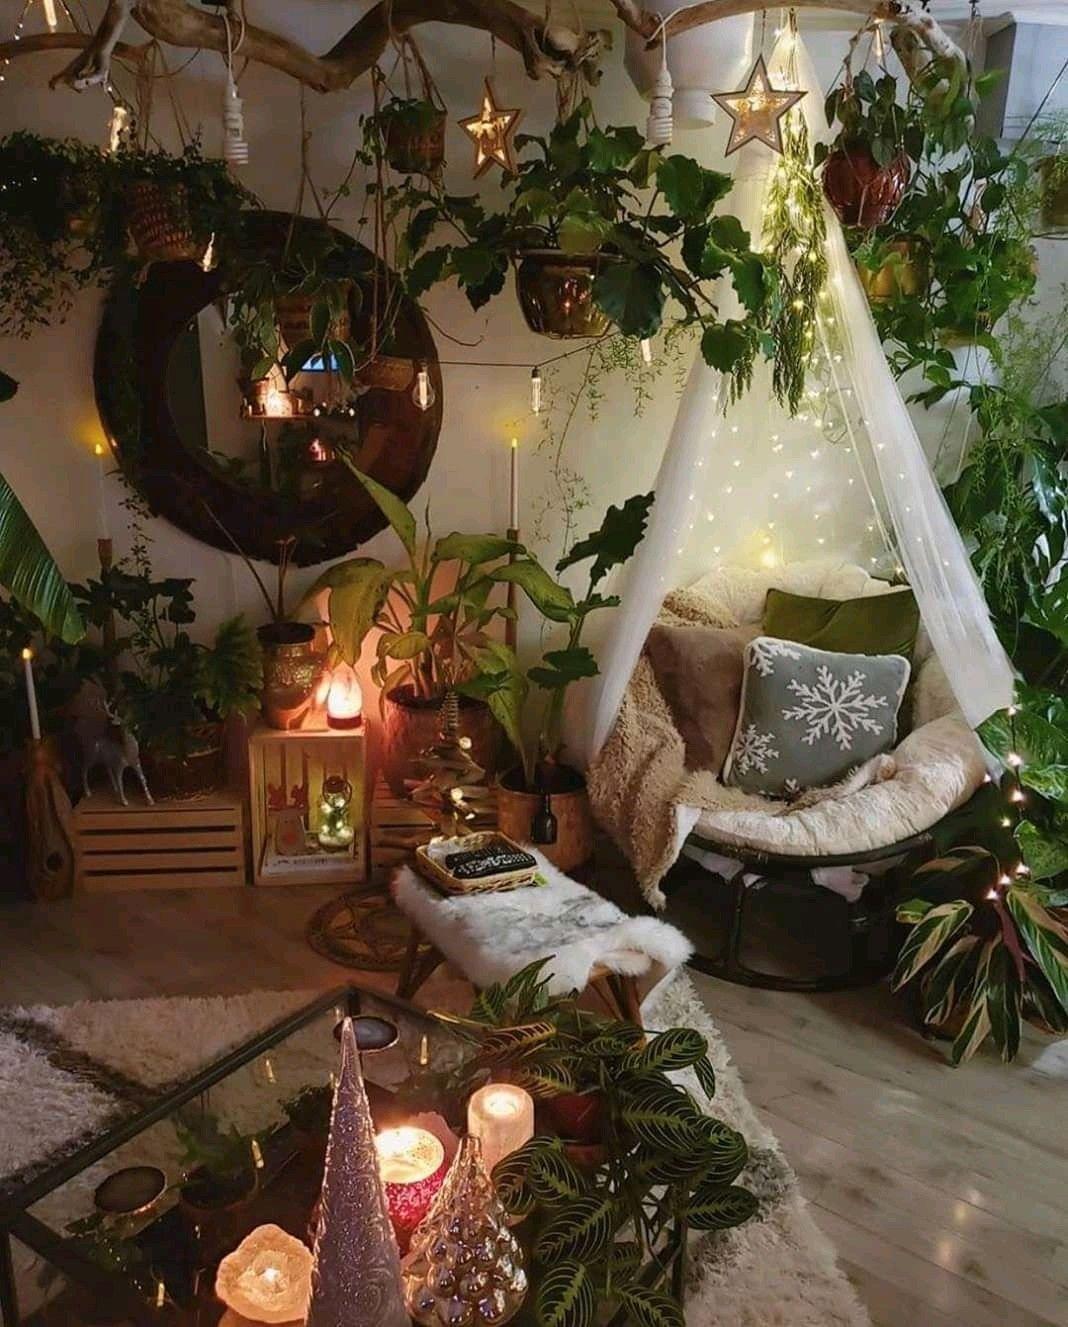 hippy room 455145106096600338 -  Bohemian Bedroom Decor,  #Bedroom #Bohemian #Decor #HousePlantsdecoration Source by jujuantonot #bohemianbedrooms